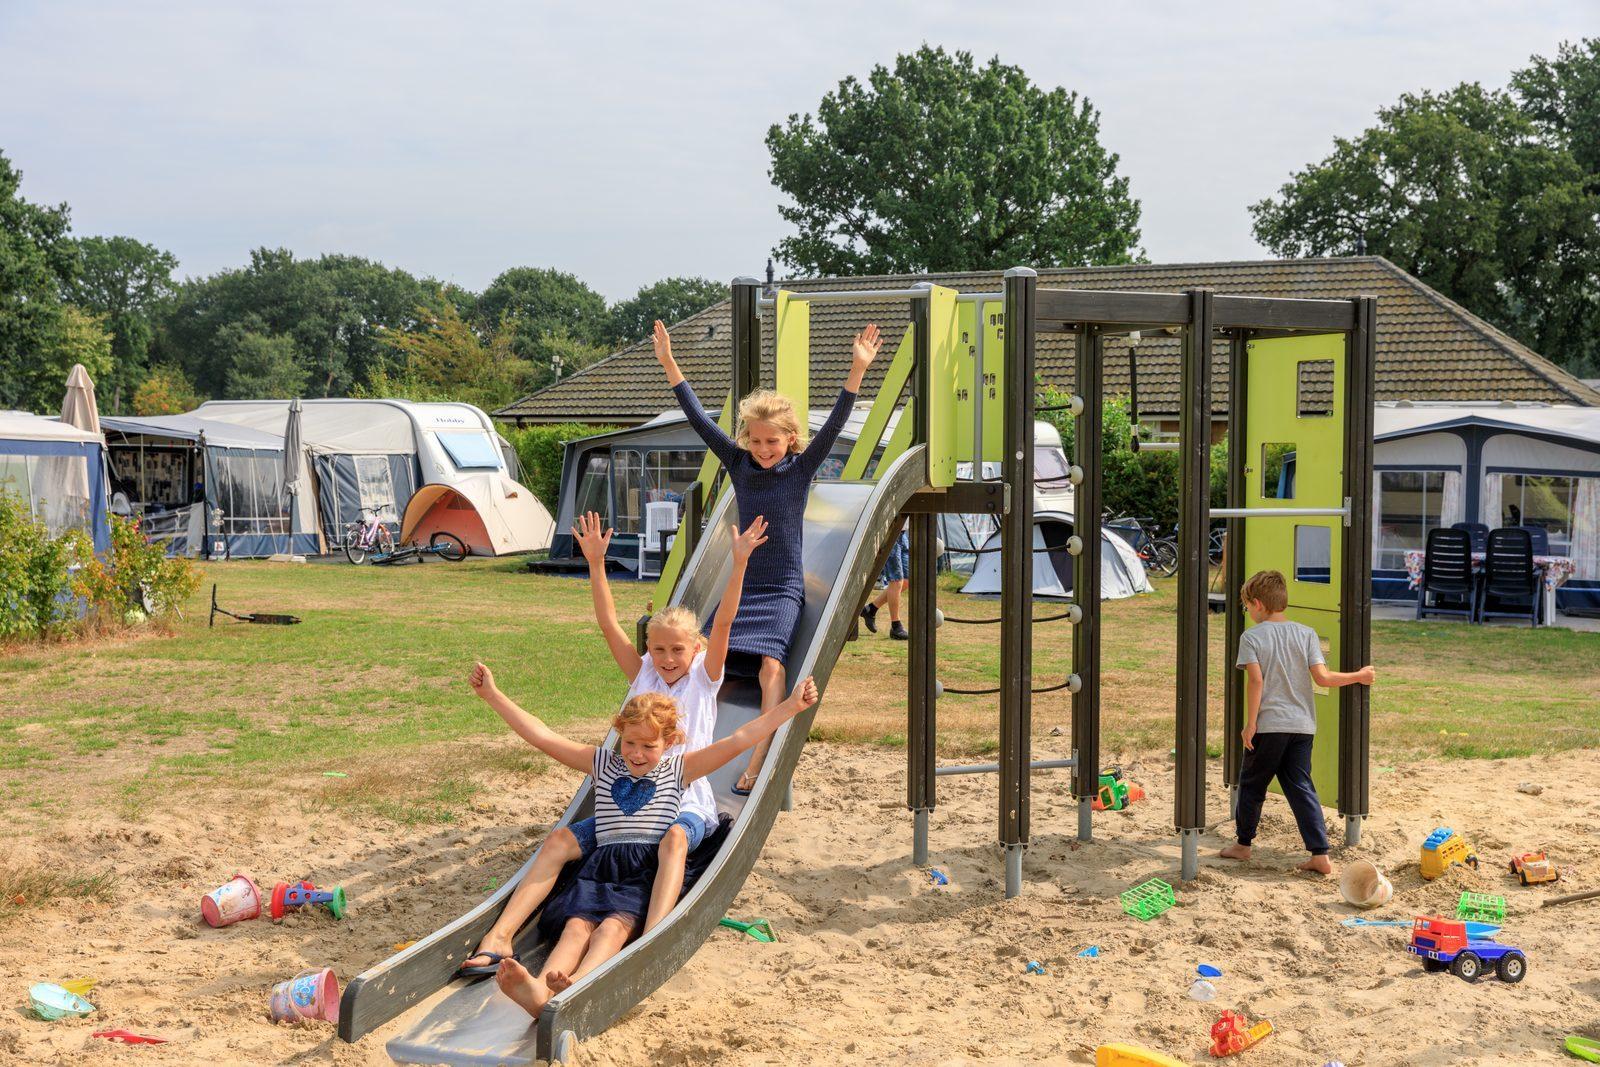 Camping in Overijssel